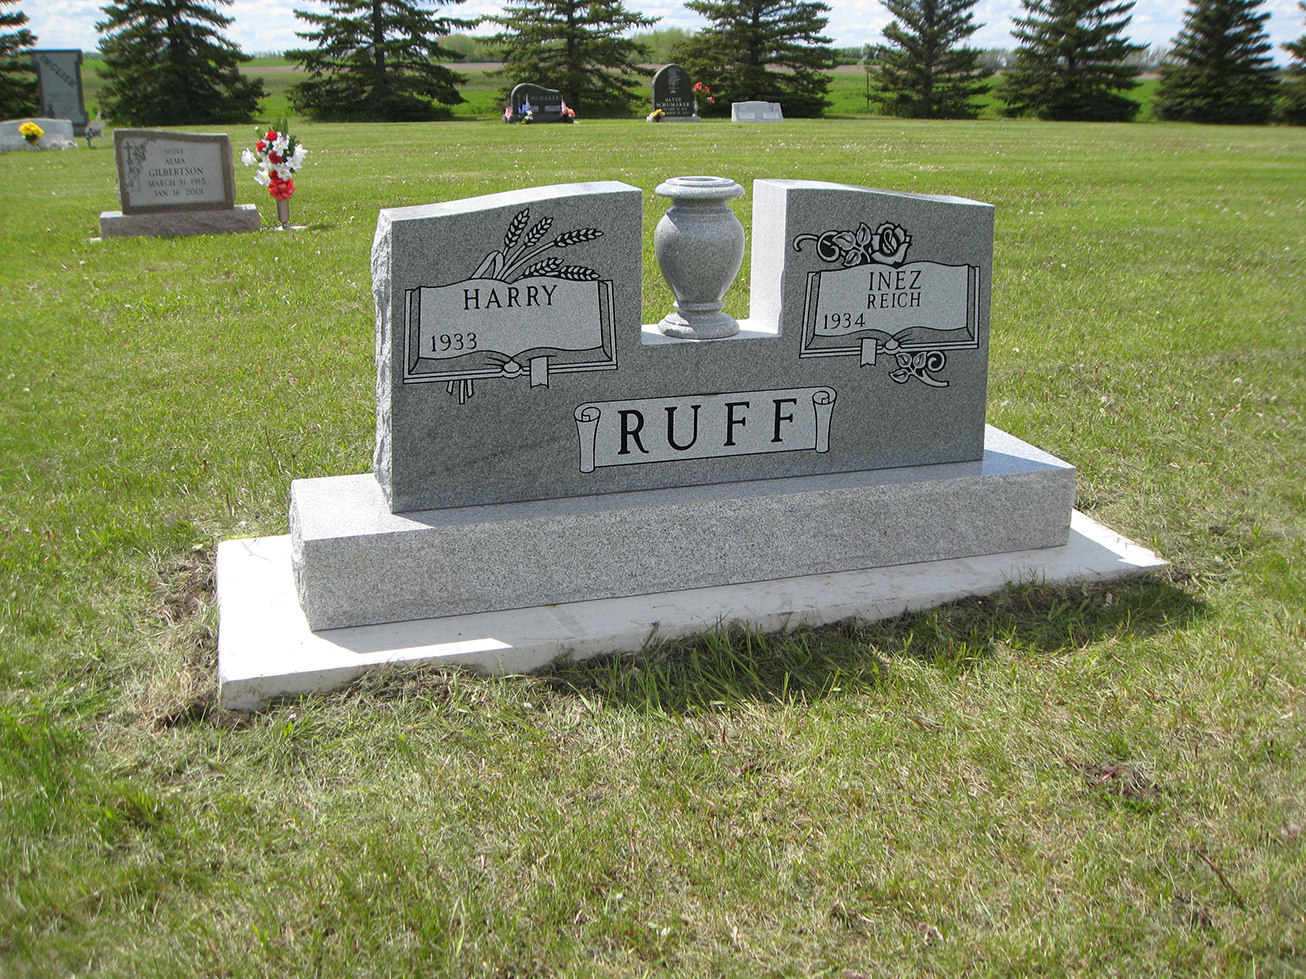 Ruffharry12 2